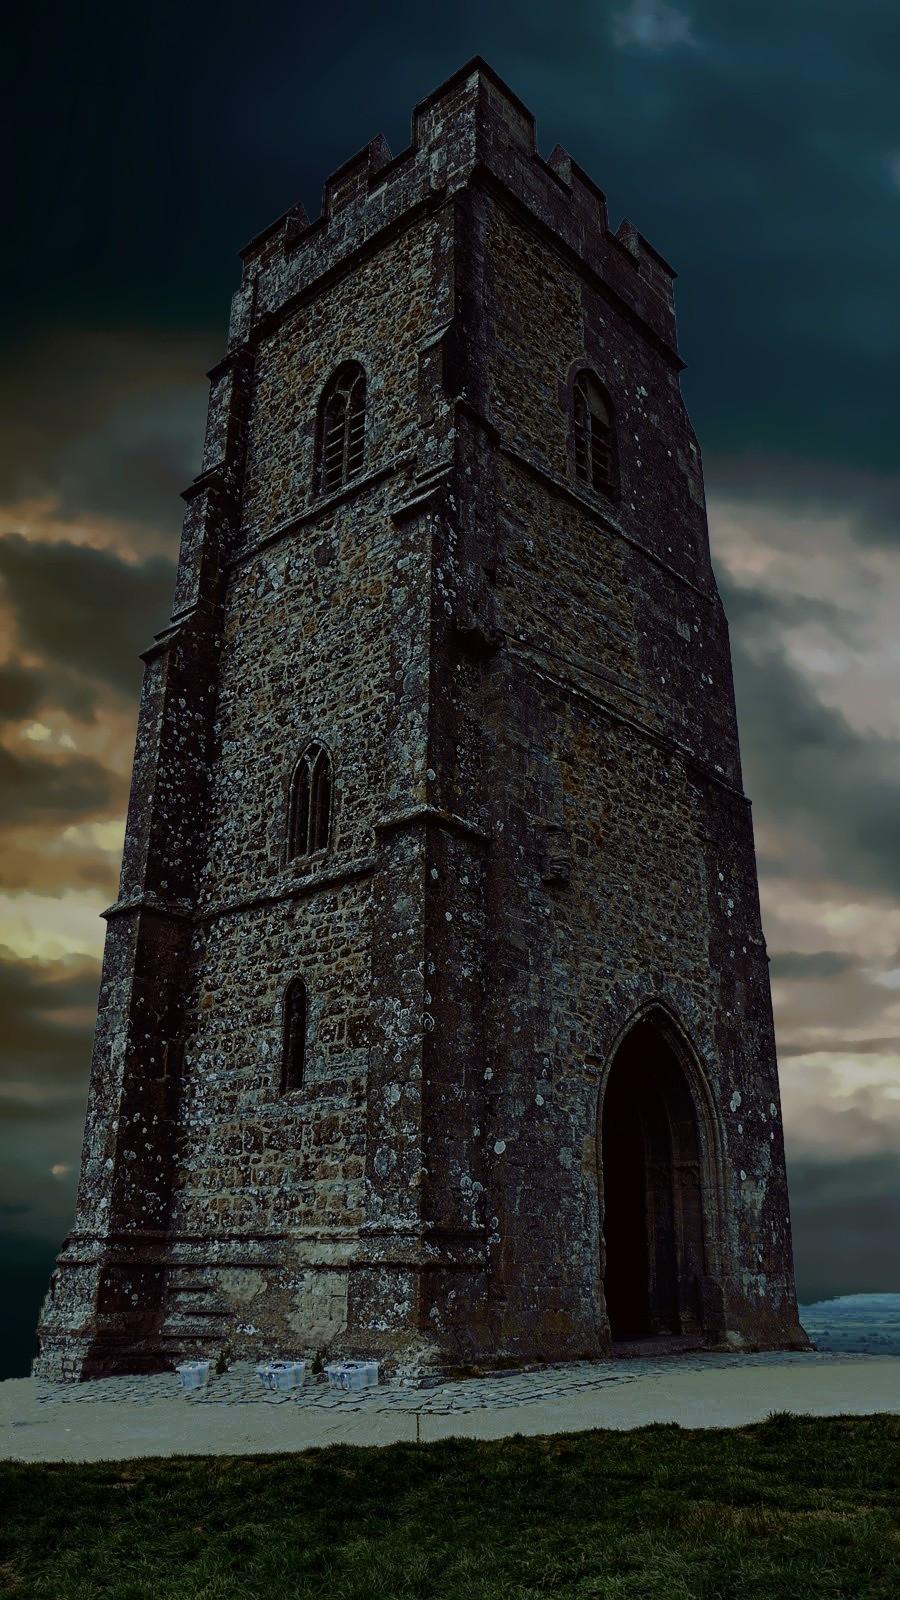 St Michaels Tower using LandscapePro.